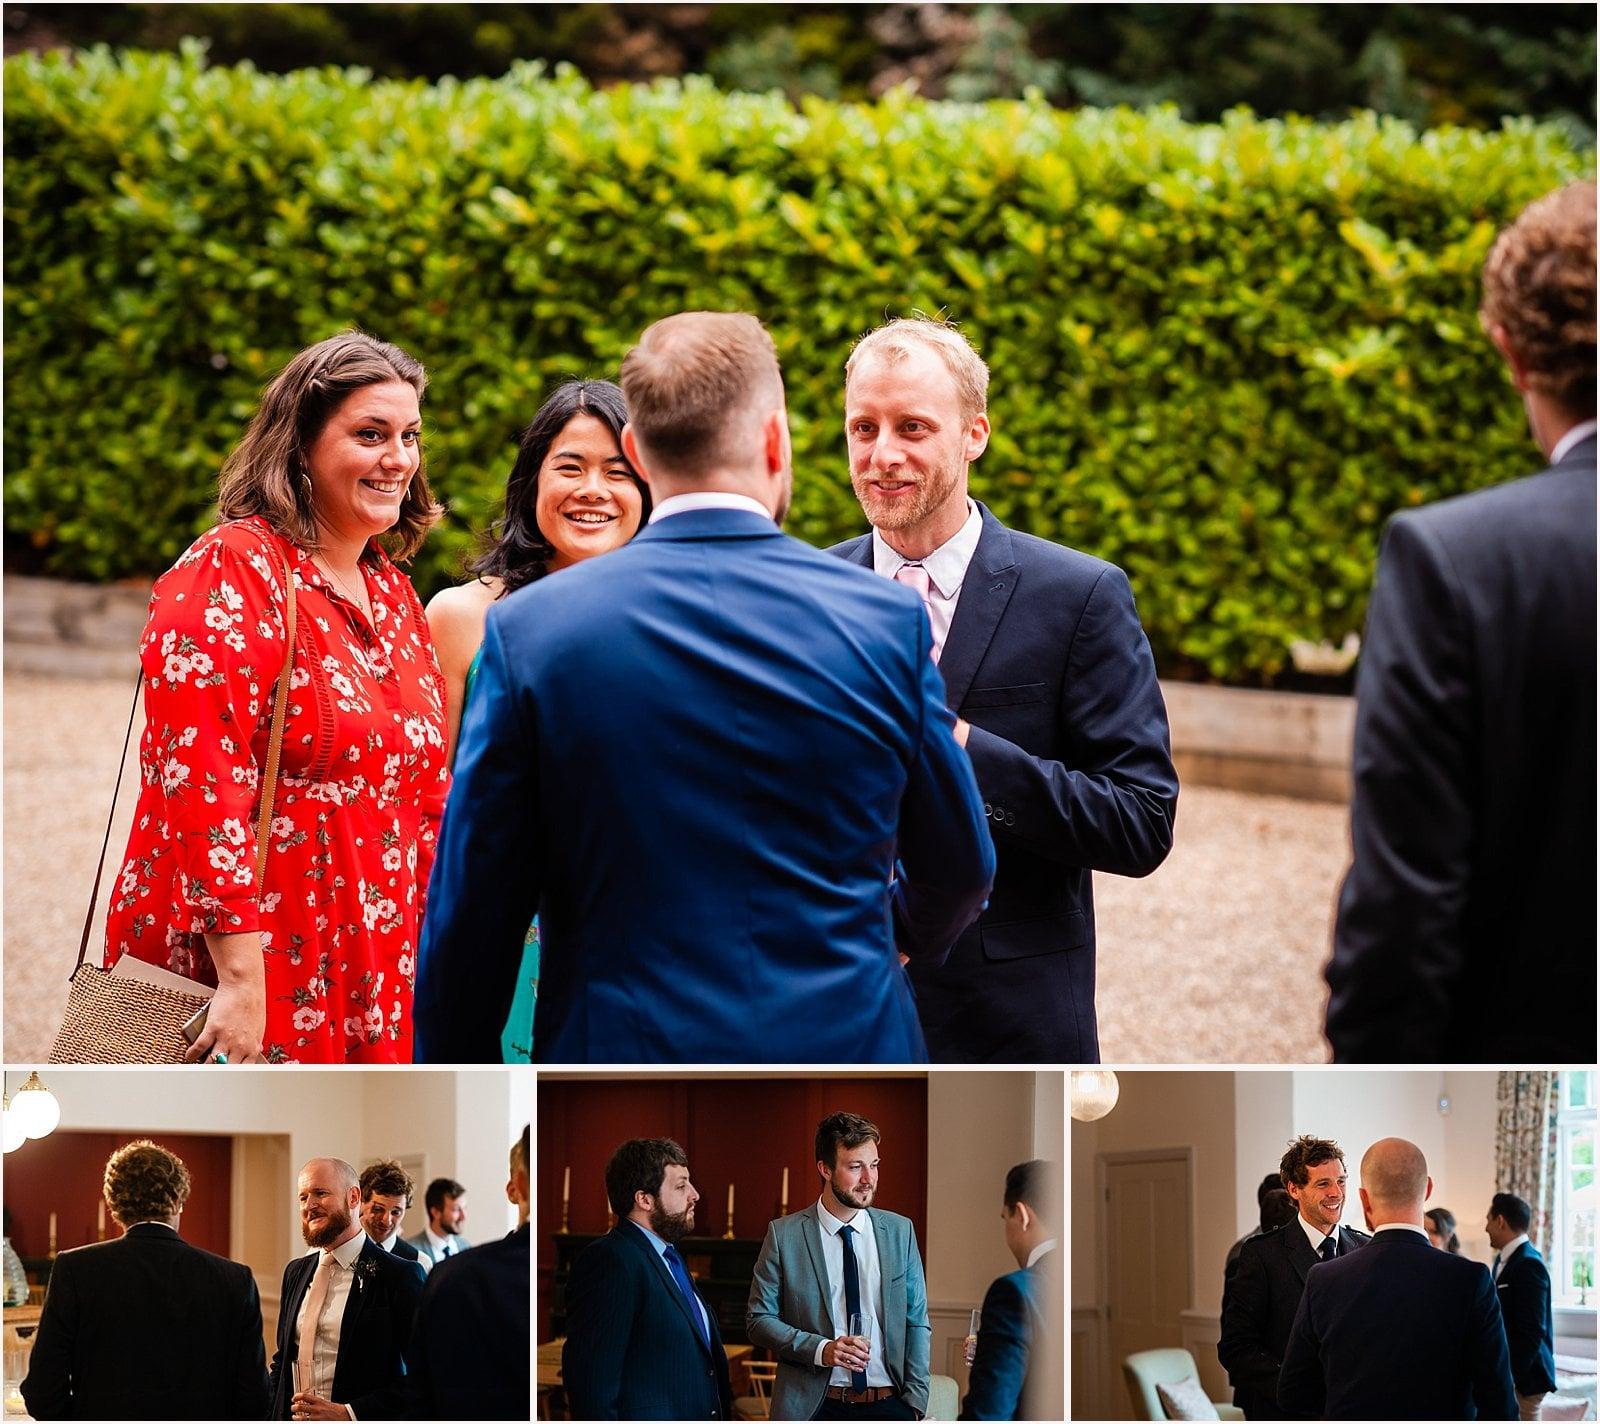 Millbridge Court Wedding - stunning summer wedding - wedding photography 17